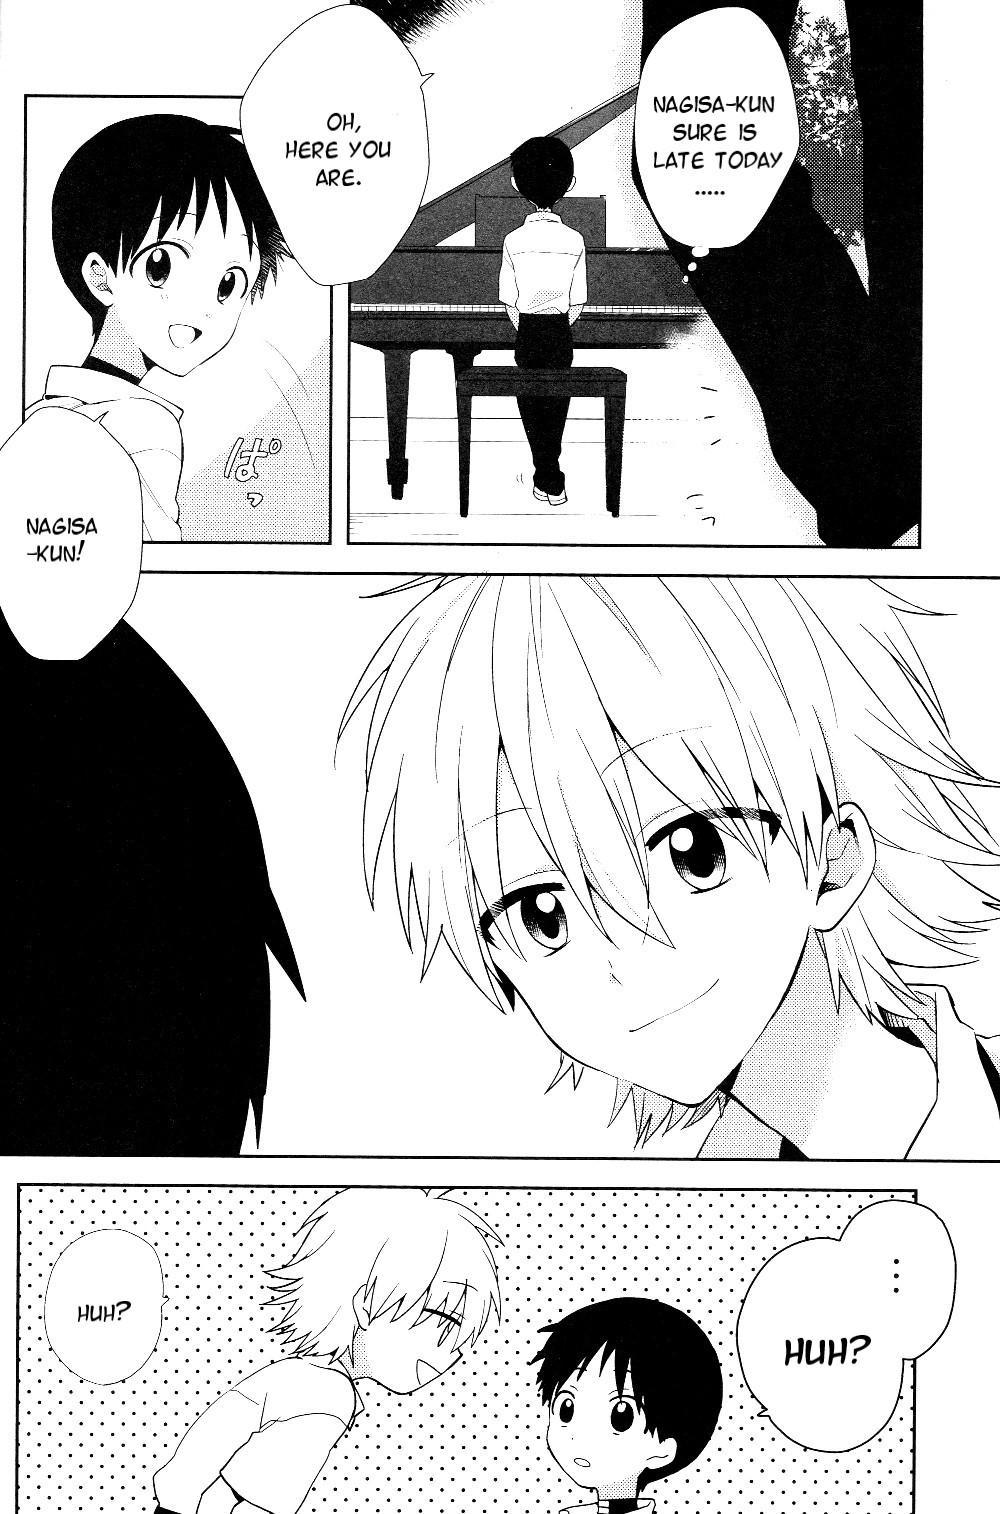 (HaruCC19) [Nicomarch (Plico)] Nagisa-kun no Iu Toori | As Nagisa-kun Commands (Neon Genesis Evangelion) [English] [TyroLuuki] 3